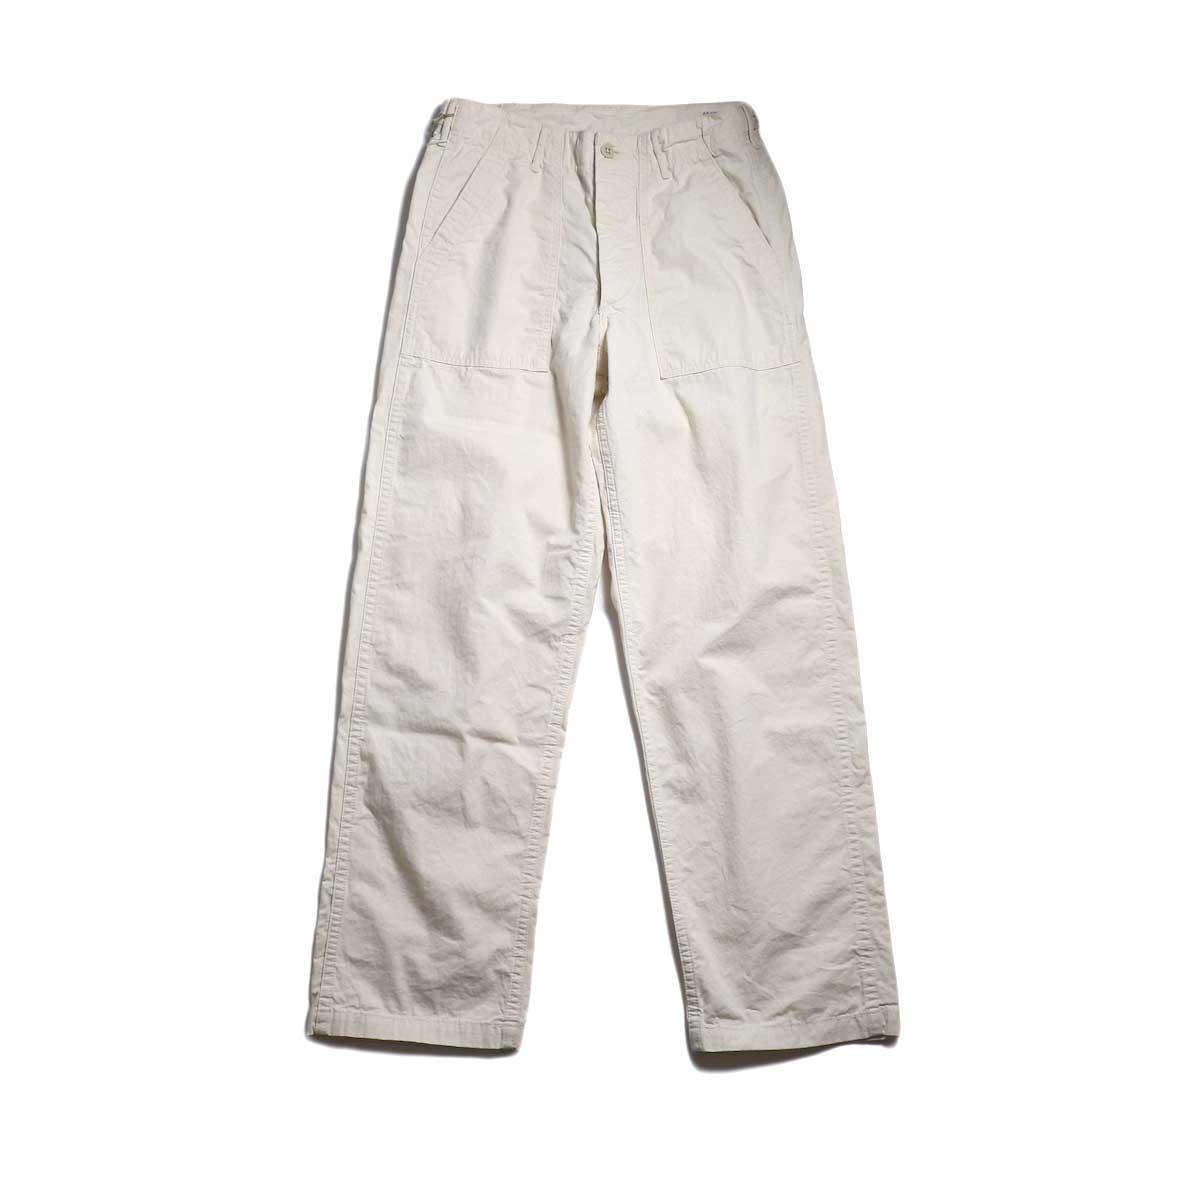 orSlow / US ARMY FATIGUE PANTS -ECRU